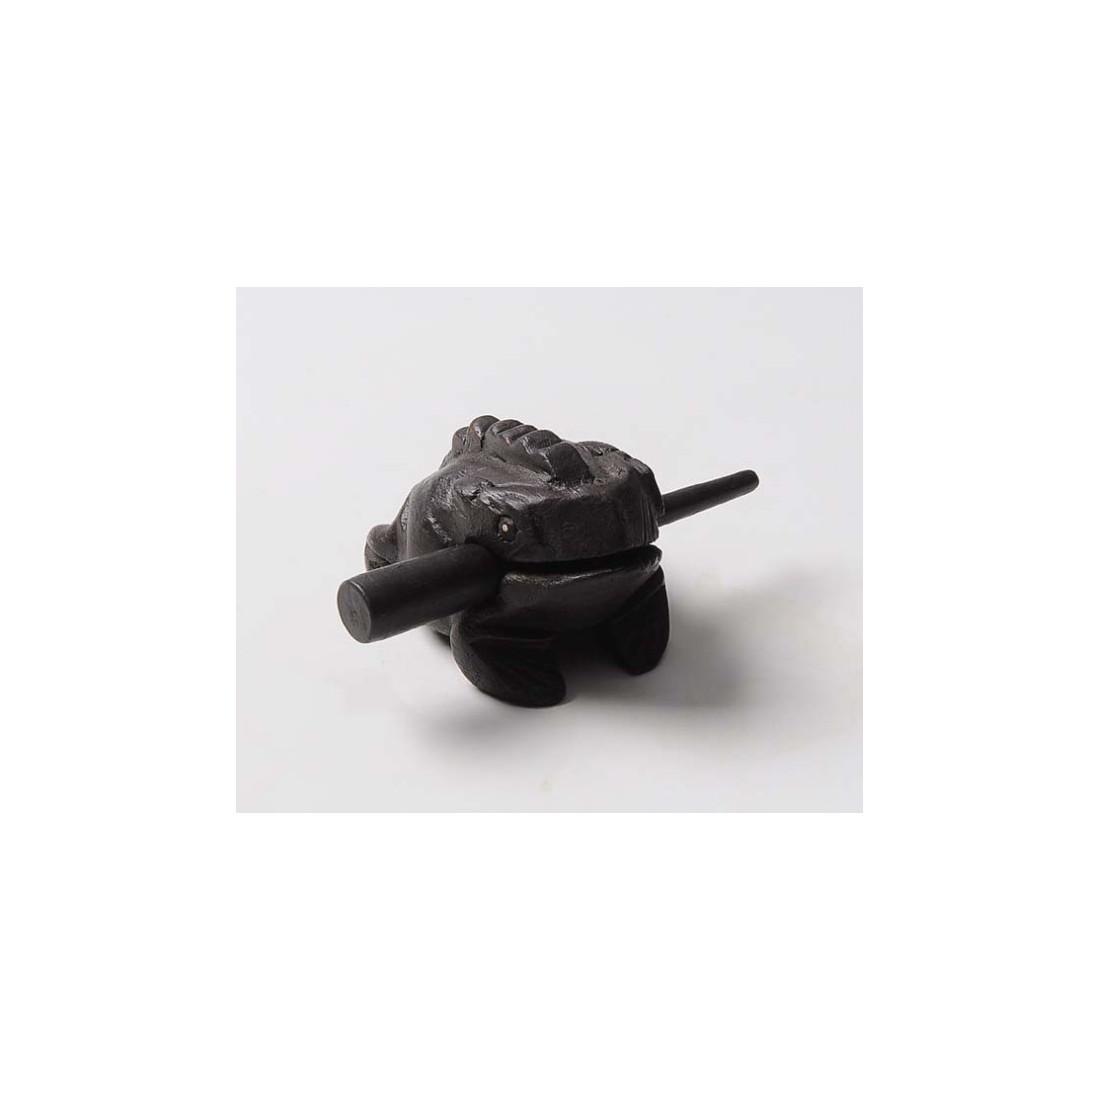 Поющая лягушка, темная